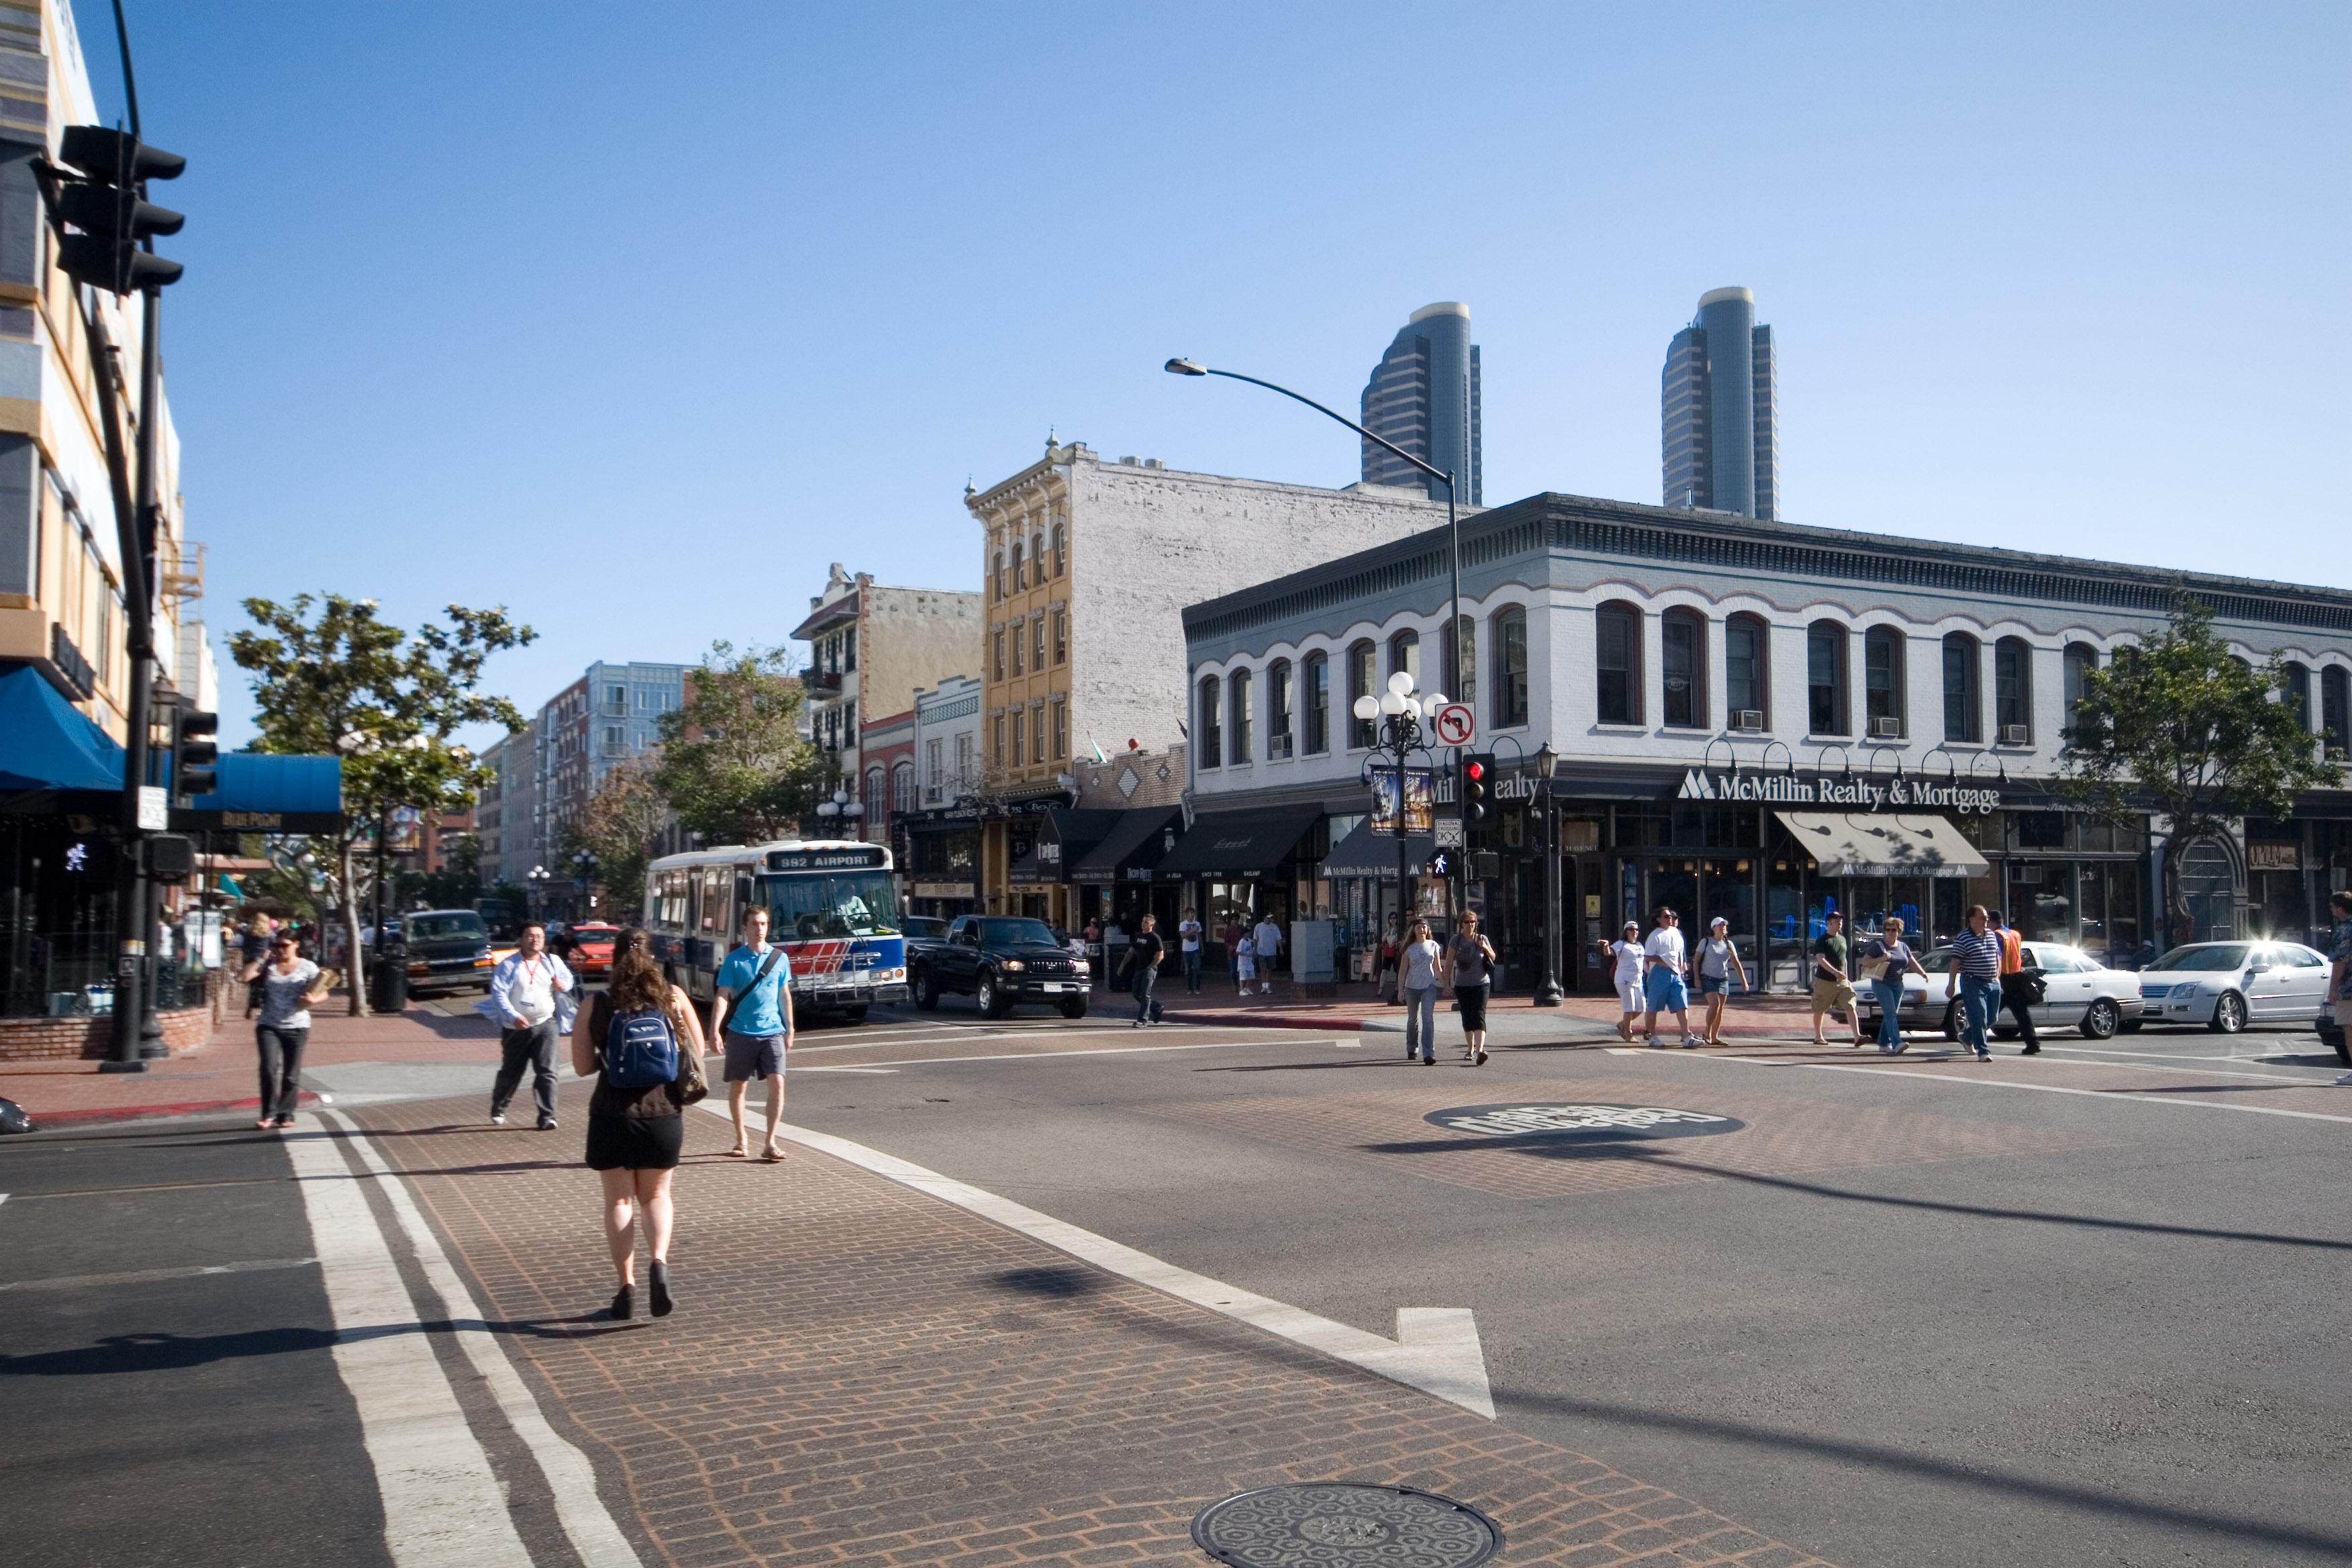 File:Gaslamp Quarter, San Diego.jpg - Wikimedia Commons